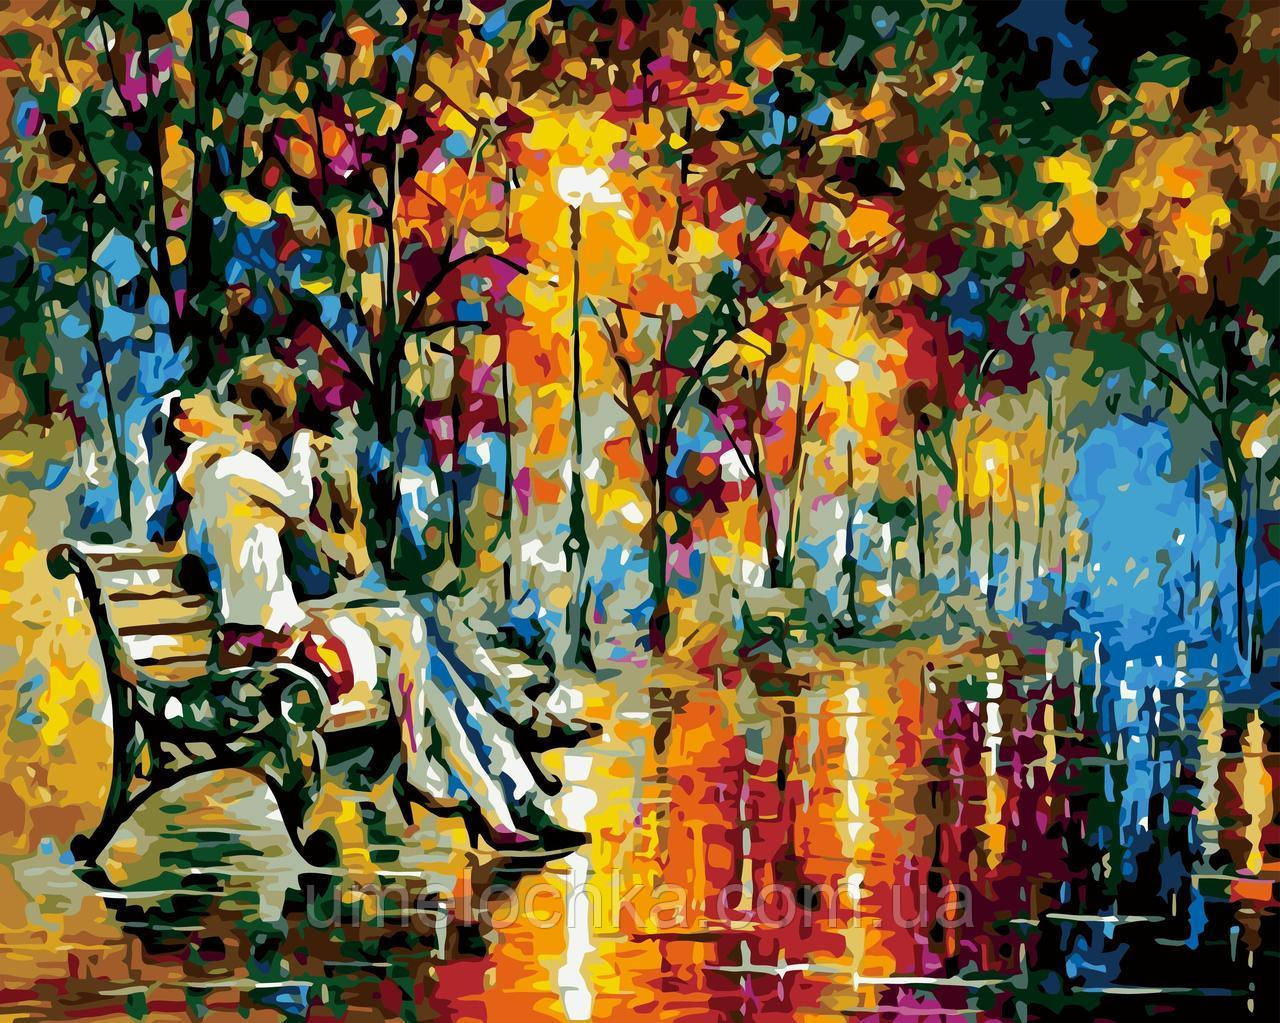 Картина-раскраска Поцелуй на скамейке худ Афремов, Леонид (BRM-GX7045) 40 х 50 см